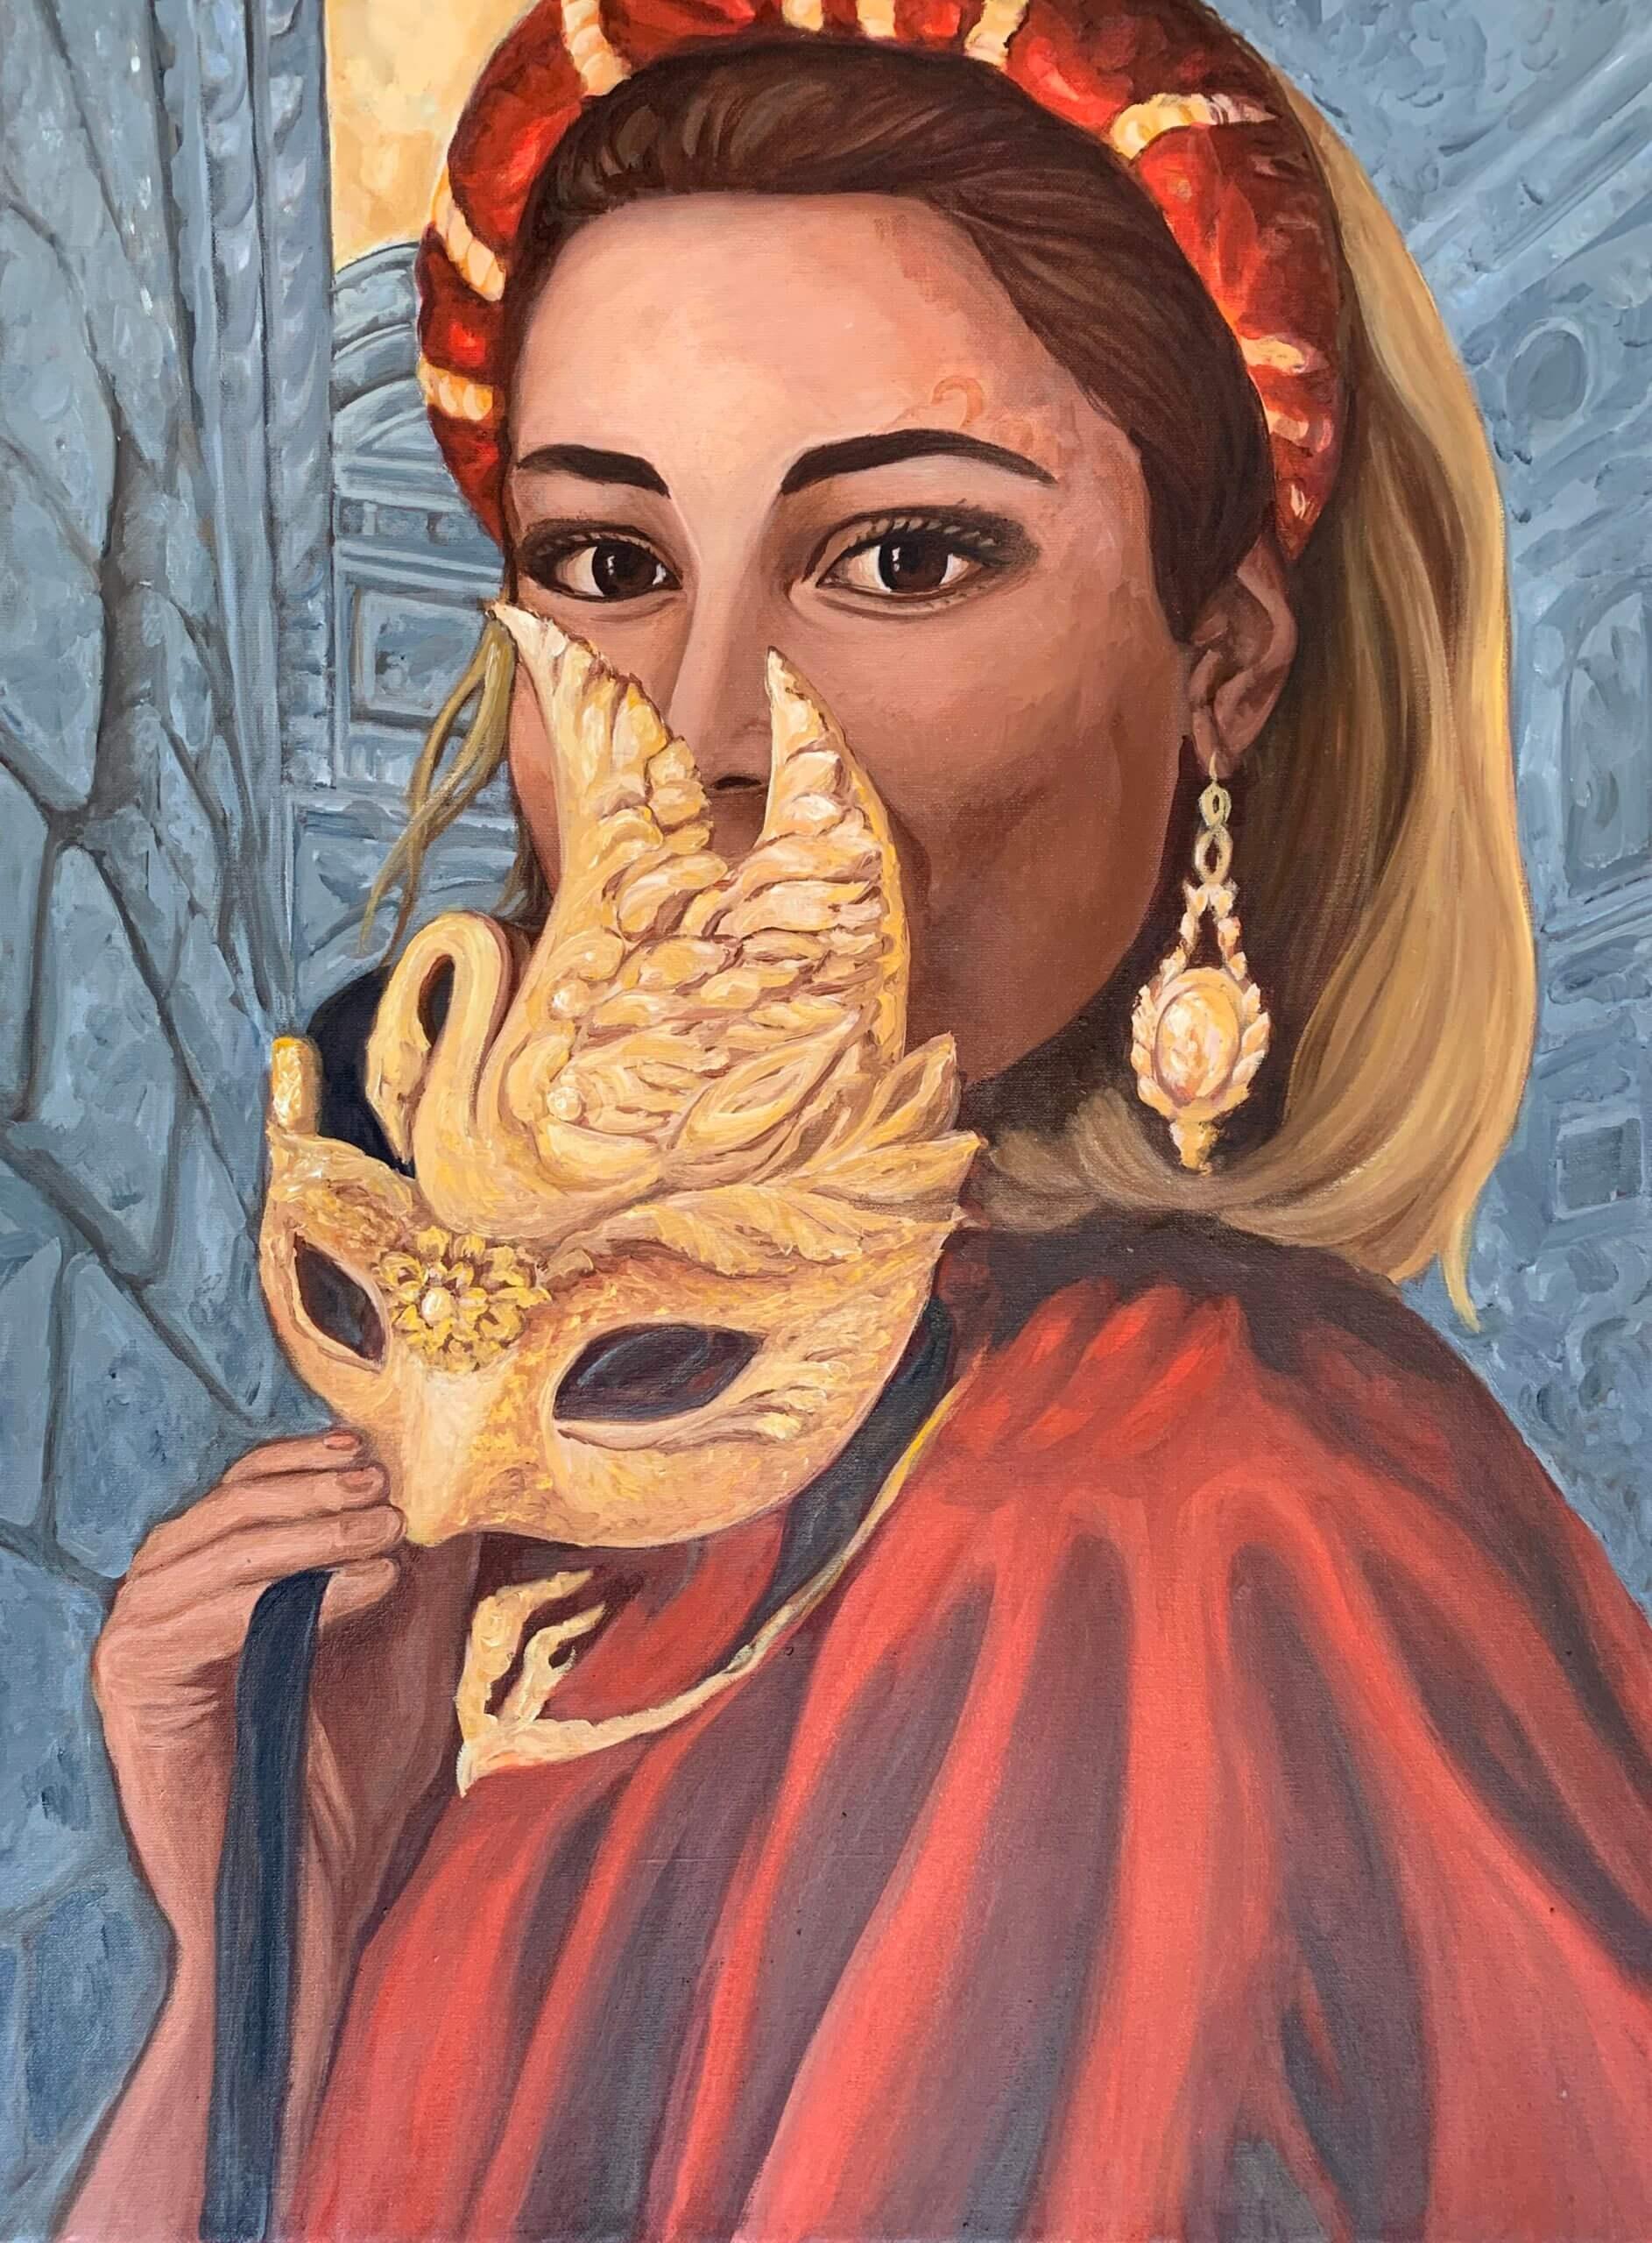 Omaggio all`amata Venezia. La mascherina rossa, 80x60cm, 2020, Öl auf Leinwand tatjana Meier